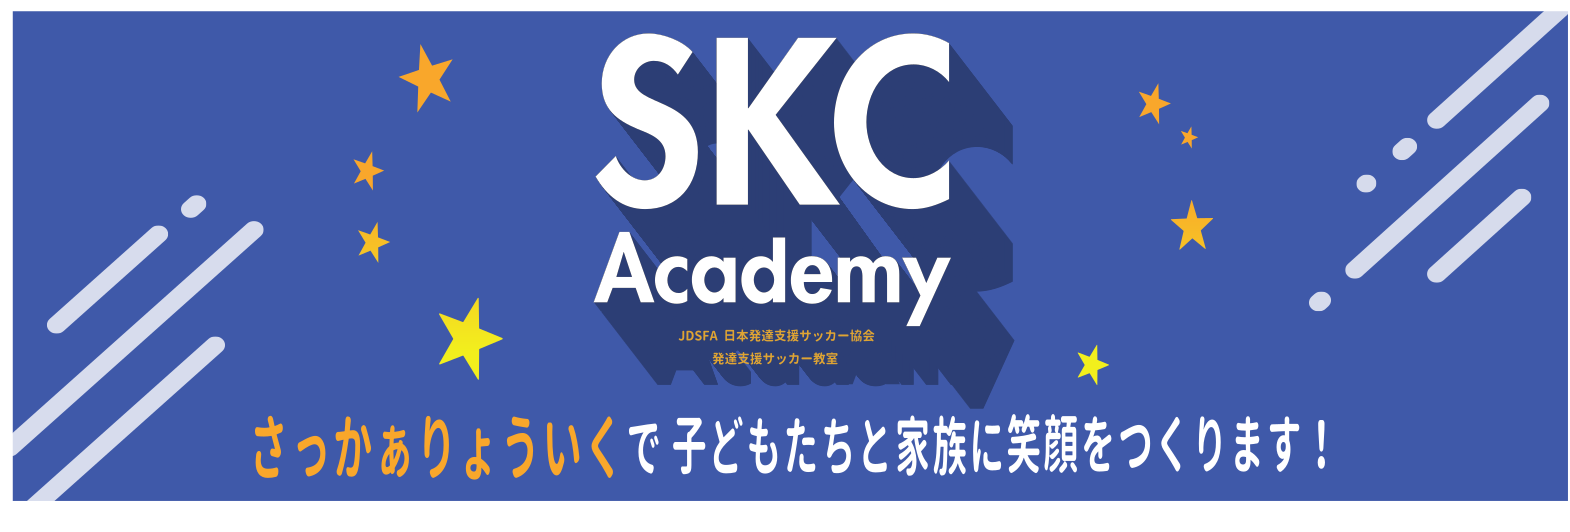 SKCアカデミーを東広島にも! 八本松で無料体験見学会を開催します